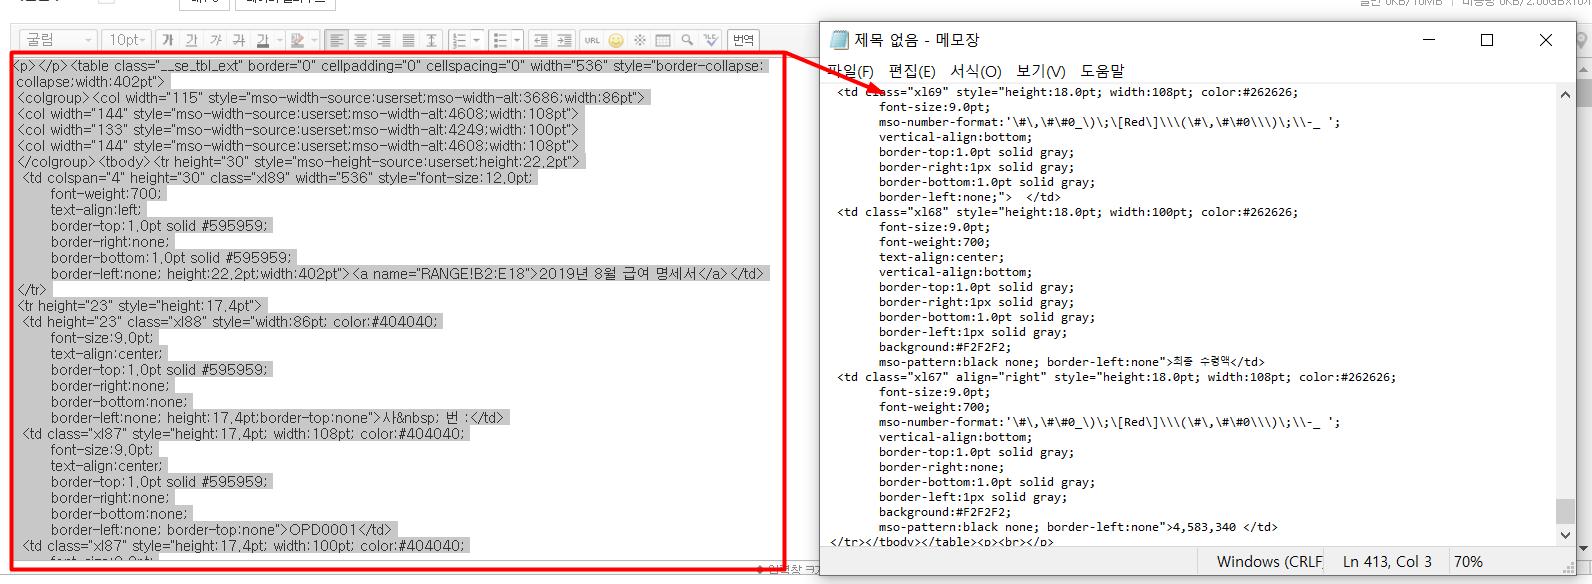 4 HTML 본문 복사 붙여넣기